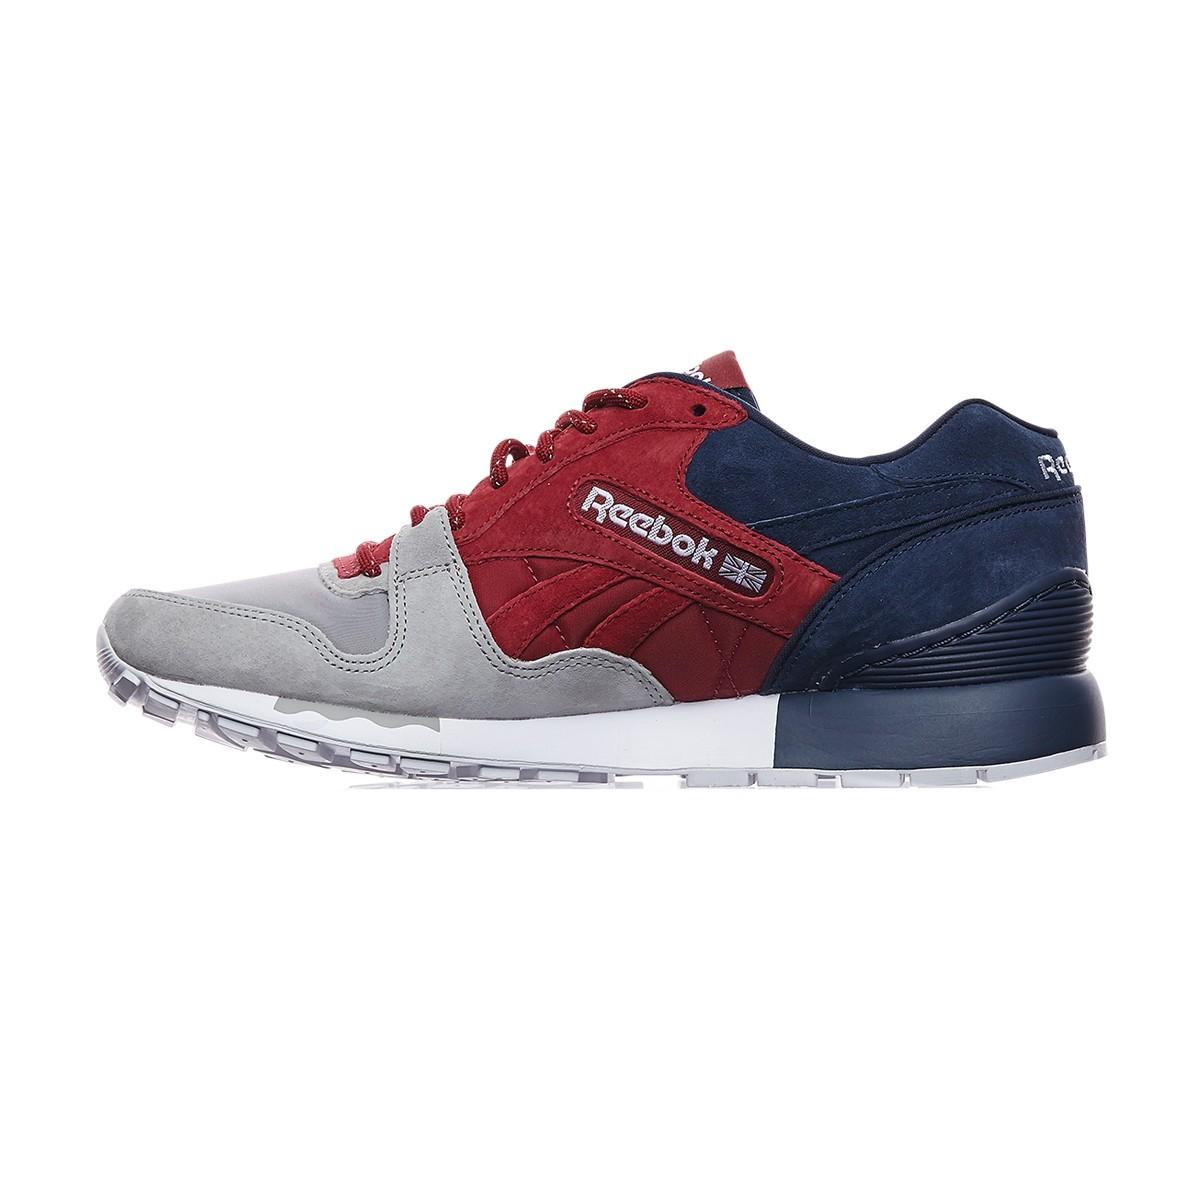 dcedc12721ed Lyst - Reebok Gl 6000  summer In New England Pack  Sneakers in Blue ...